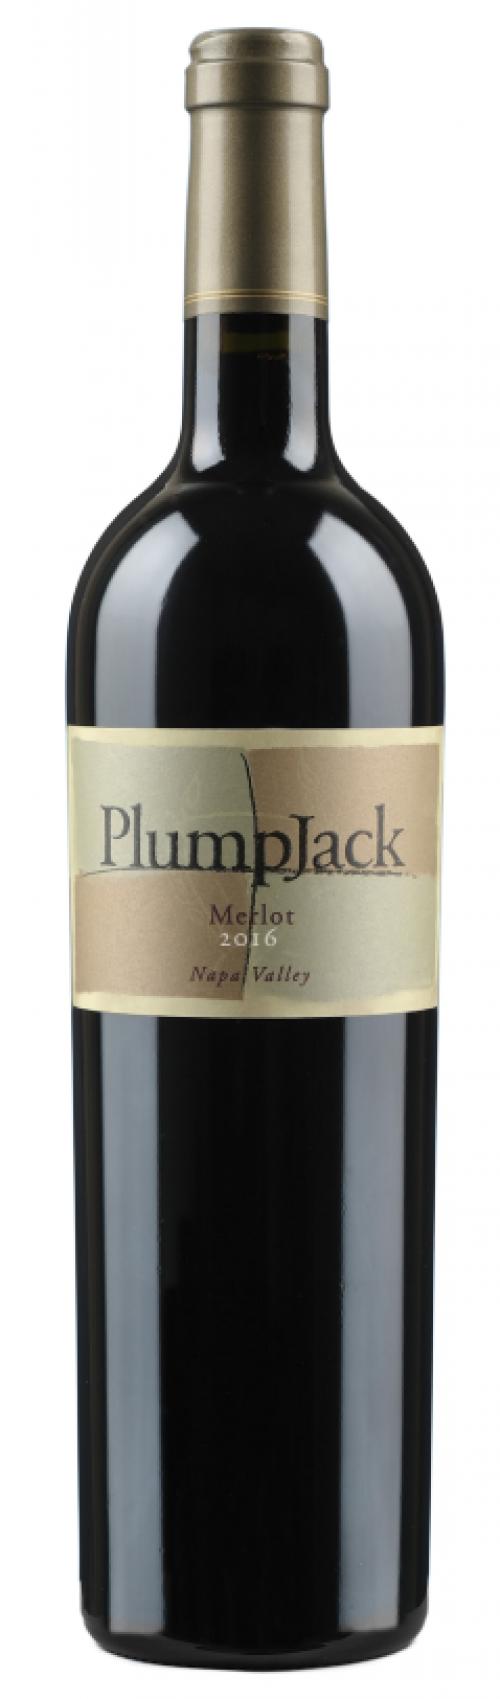 2016 Plumpjack Napa Merlot 750Ml